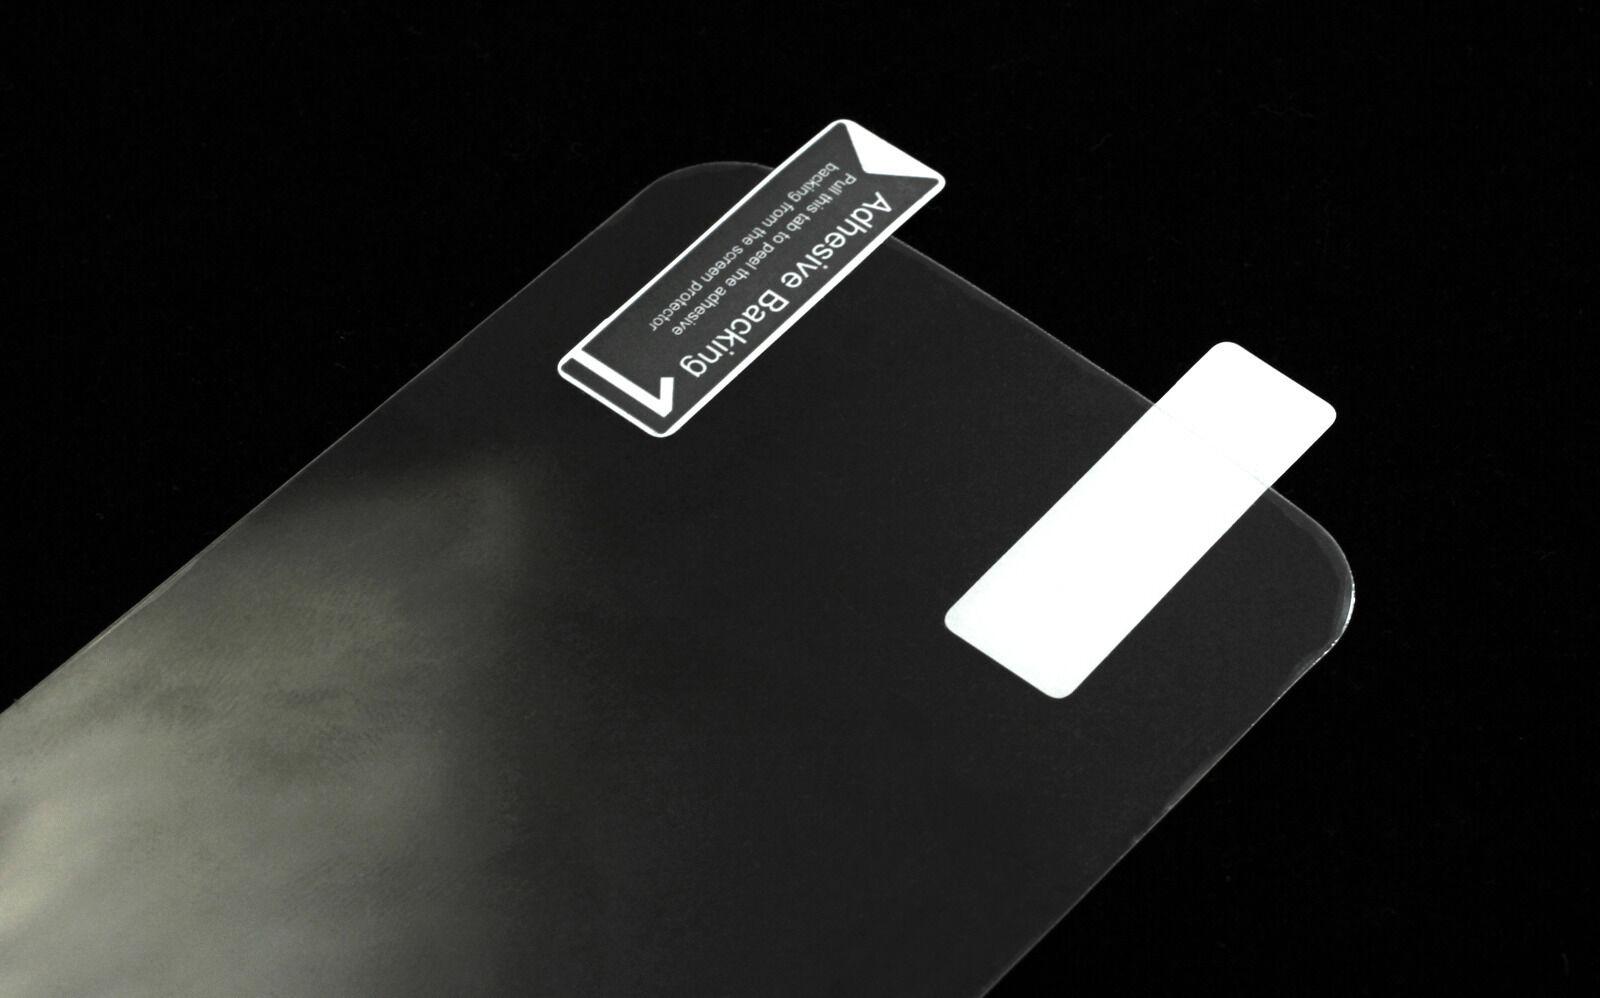 2X EZguardz LCD Screen Protector Cover HD 2X For eFun Nextbook 8 NX785 Tablet